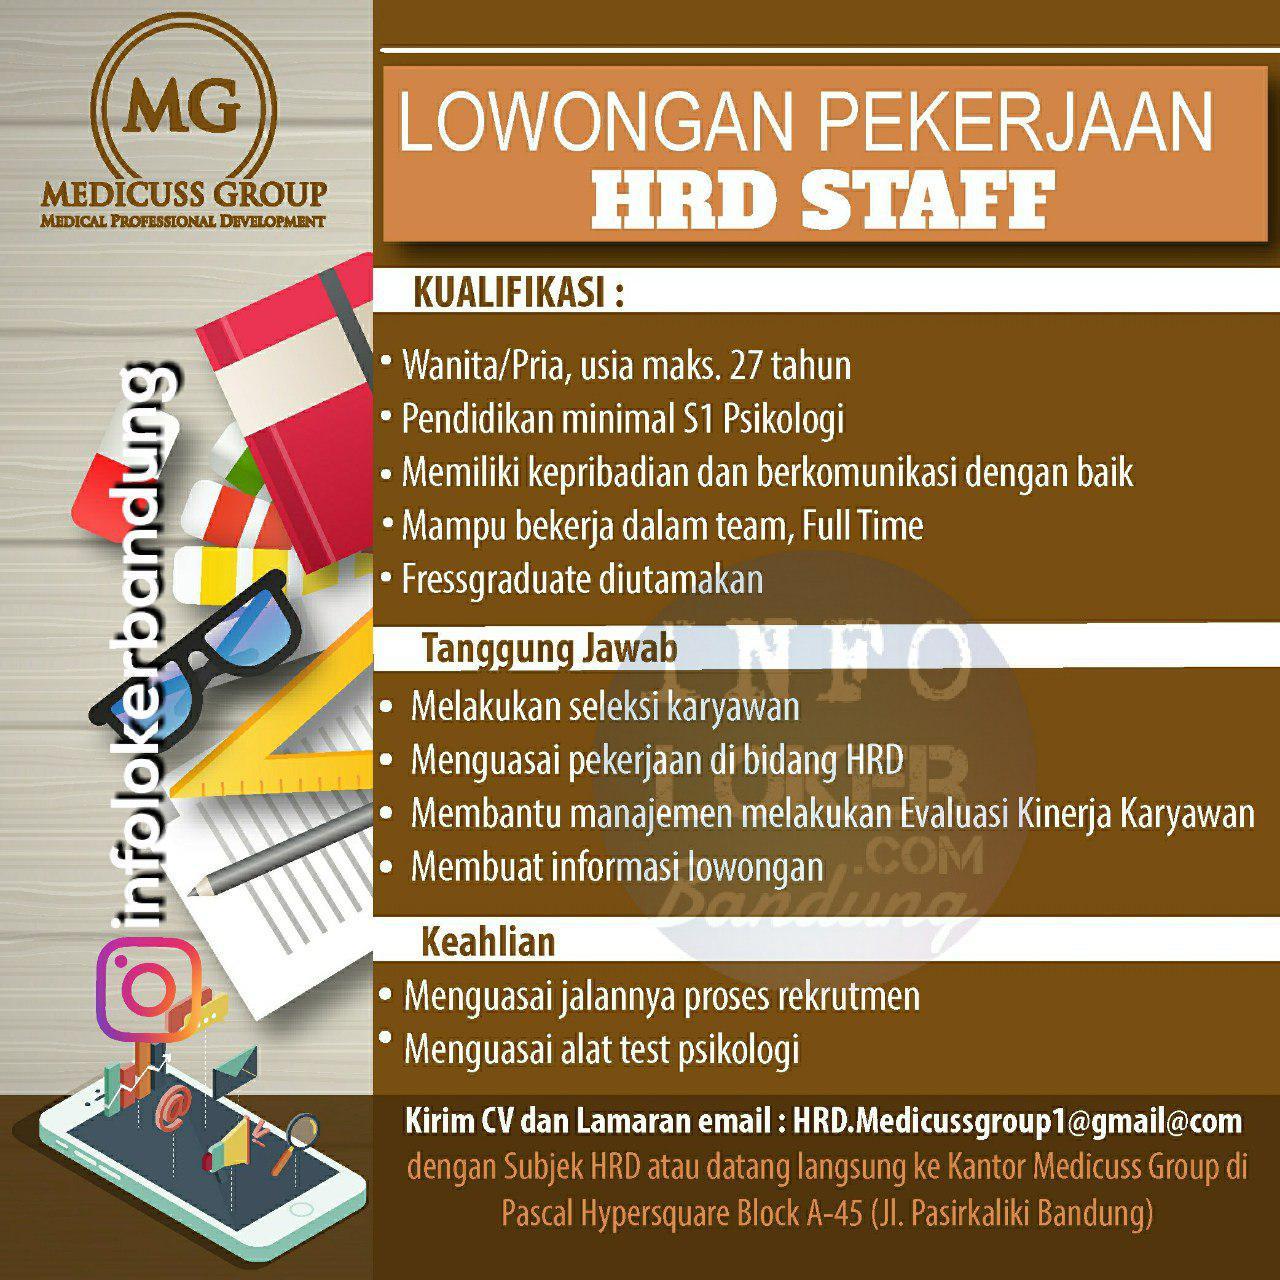 Lowongan Kerja HRD Staff Medicuss Group Bandung Mei 2018